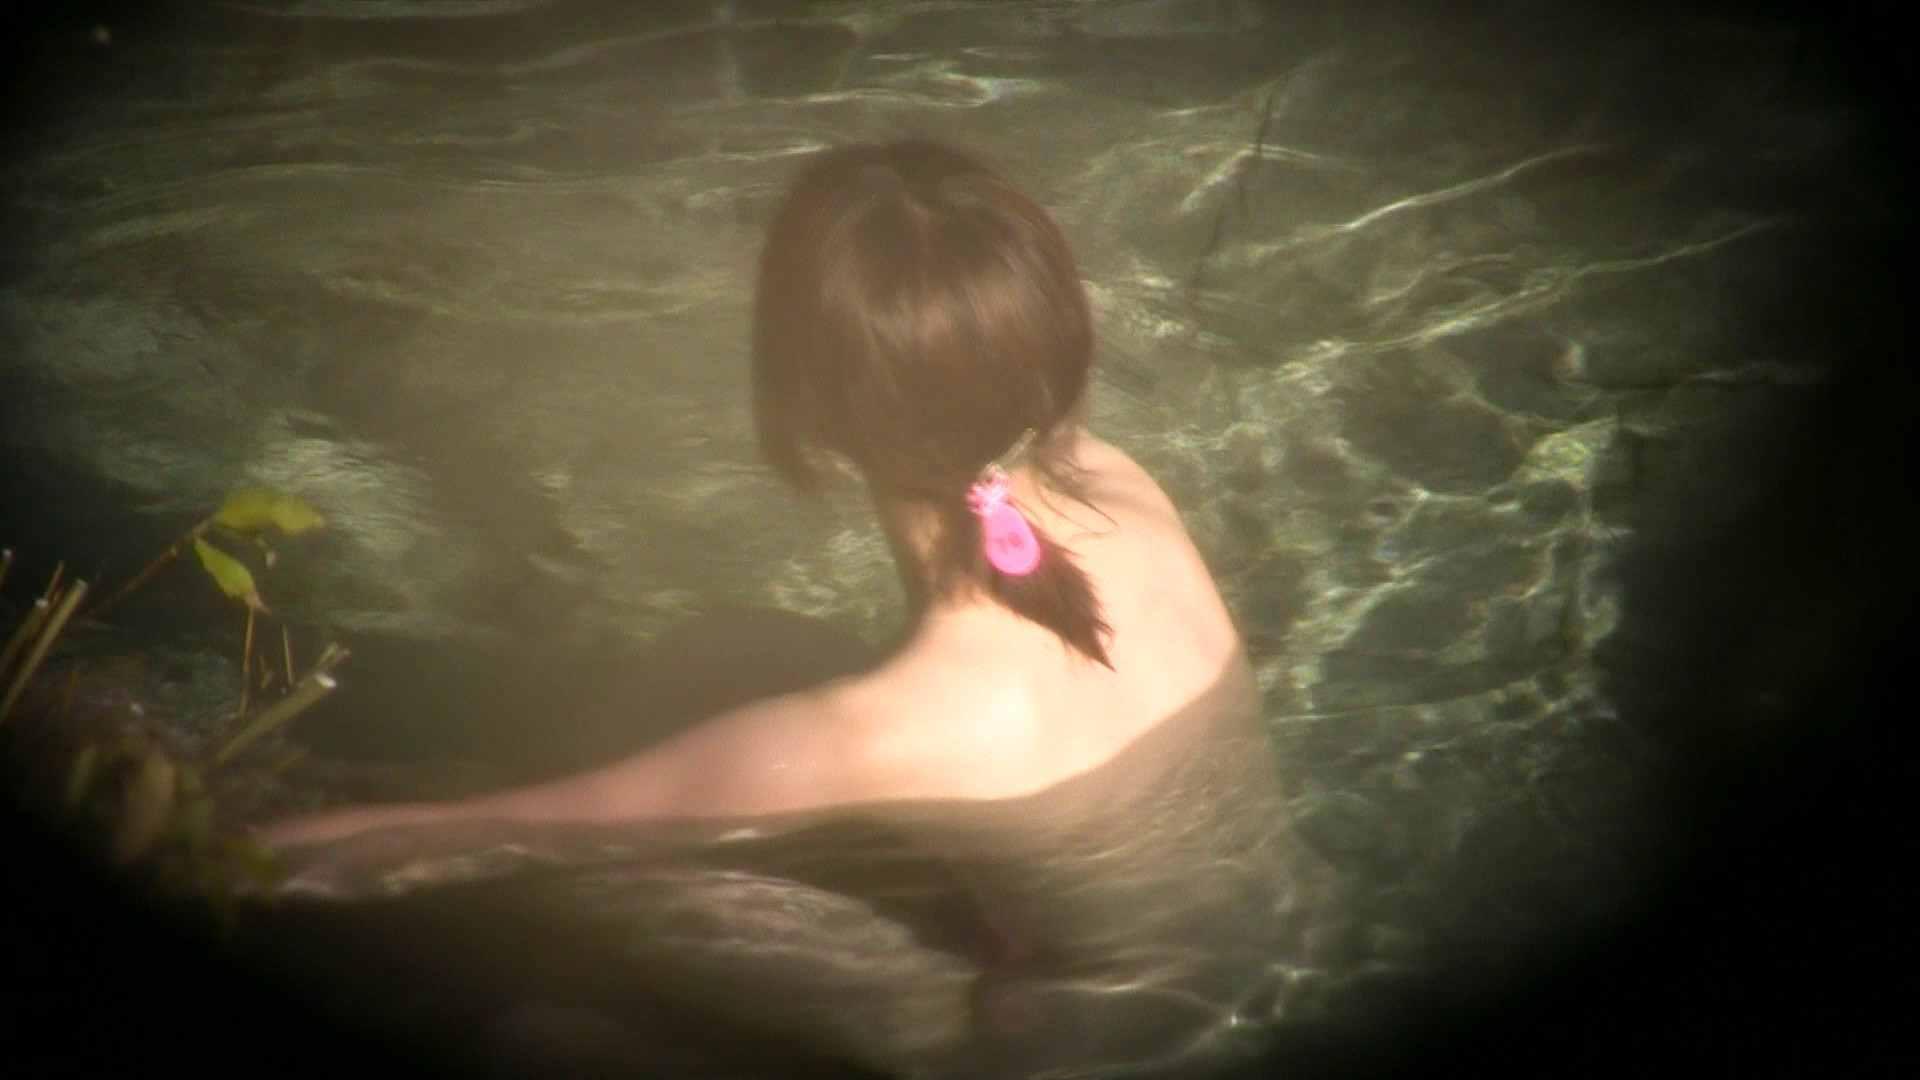 Aquaな露天風呂Vol.698 盗撮師作品  104pic 57